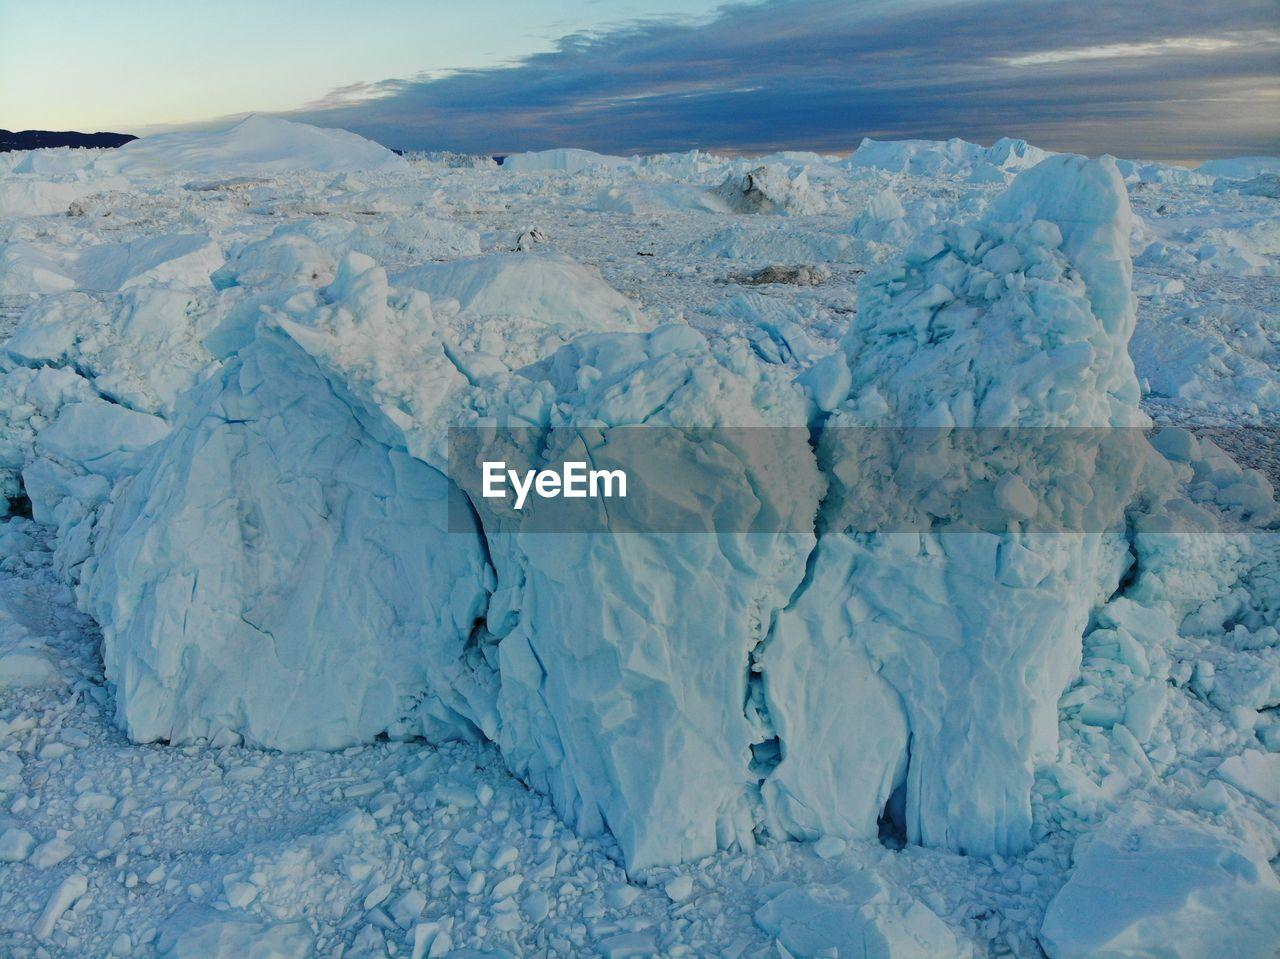 scenics - nature, cold temperature, beauty in nature, tranquil scene, ice, glacier, tranquility, environment, landscape, winter, snow, nature, day, sky, idyllic, no people, frozen, remote, white color, iceberg